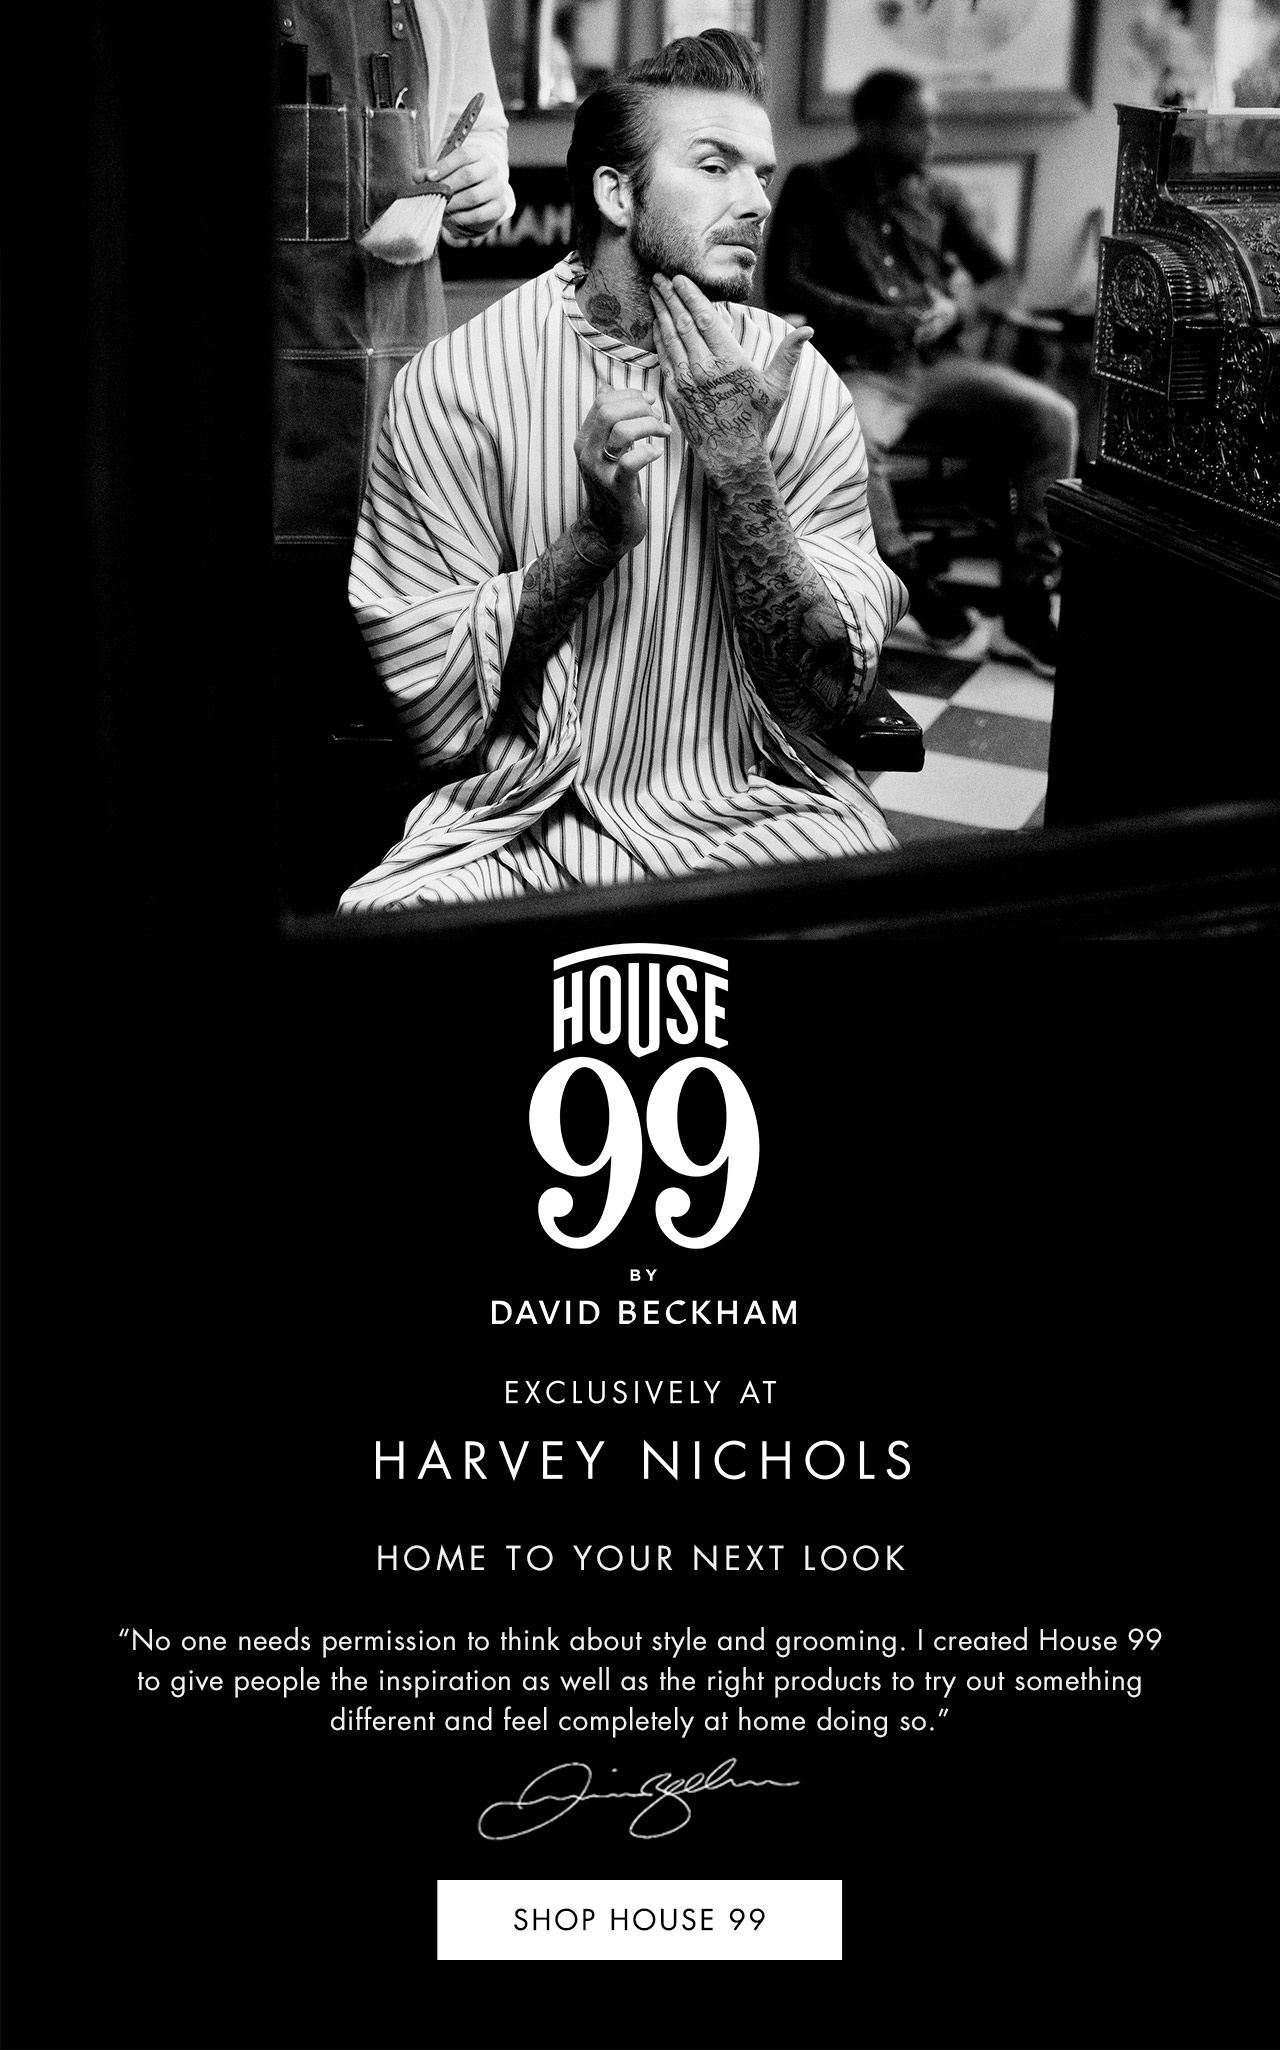 house 99 by david beckham typography david beckham cool fonts rh pinterest com